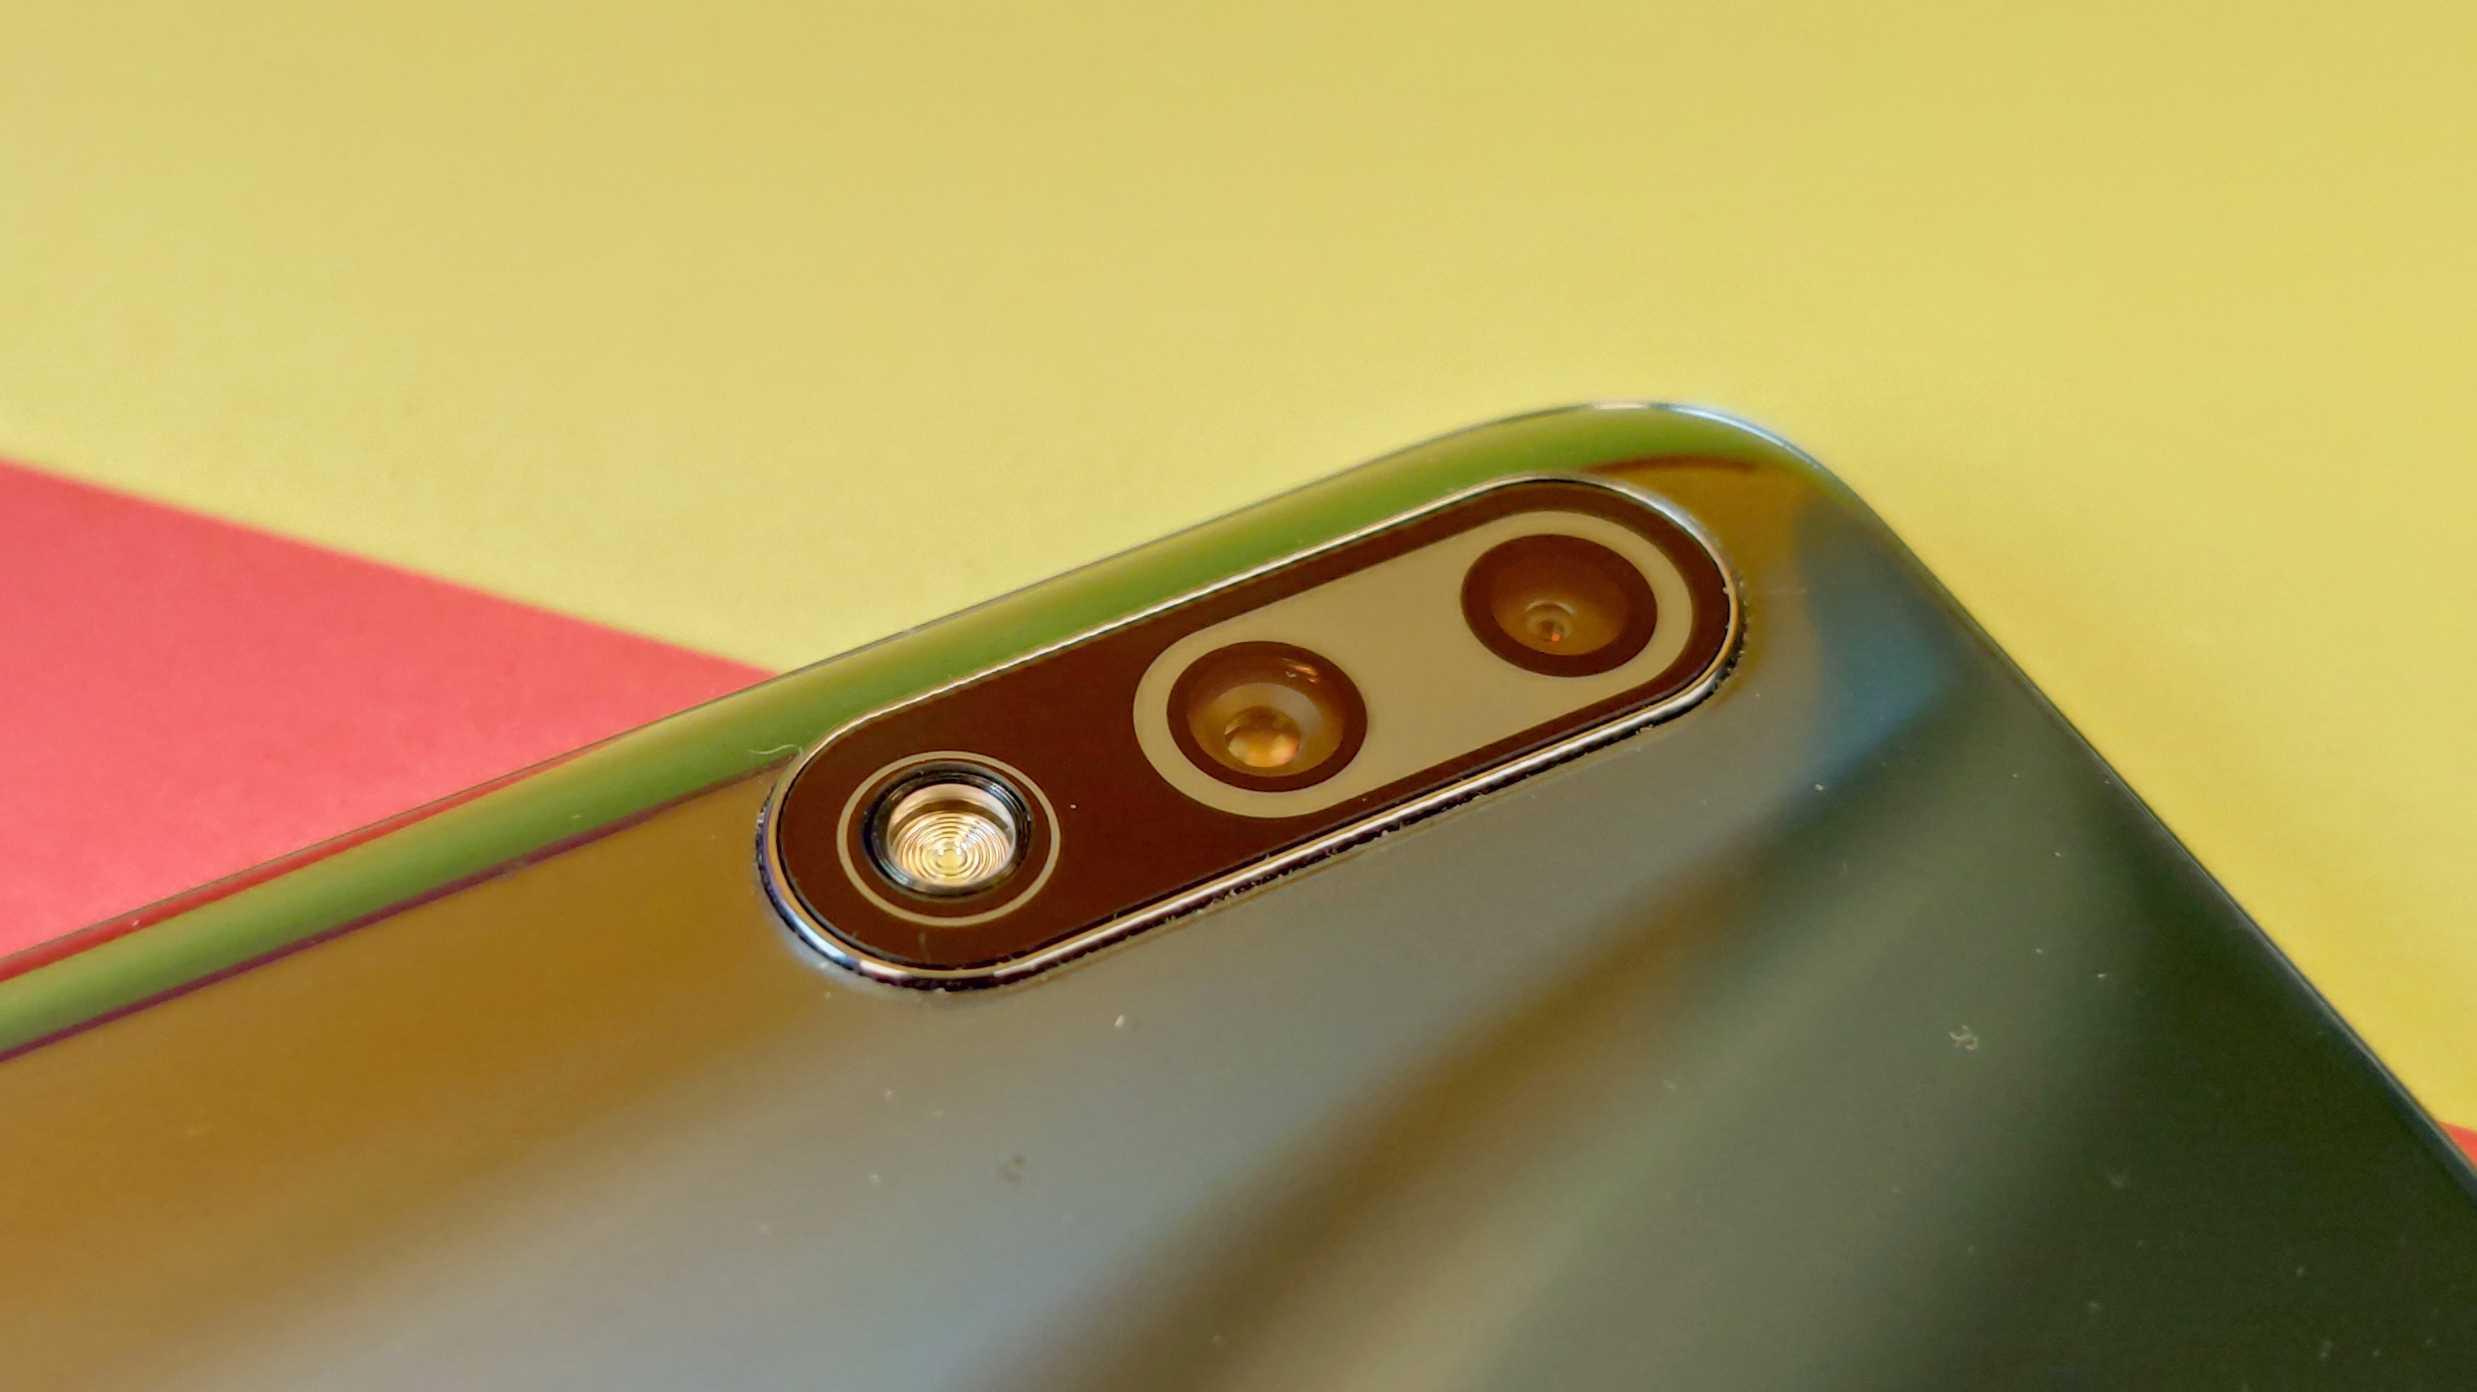 Kamera-Smartphones mit optischem Bildstabilisator bis 300 Euro